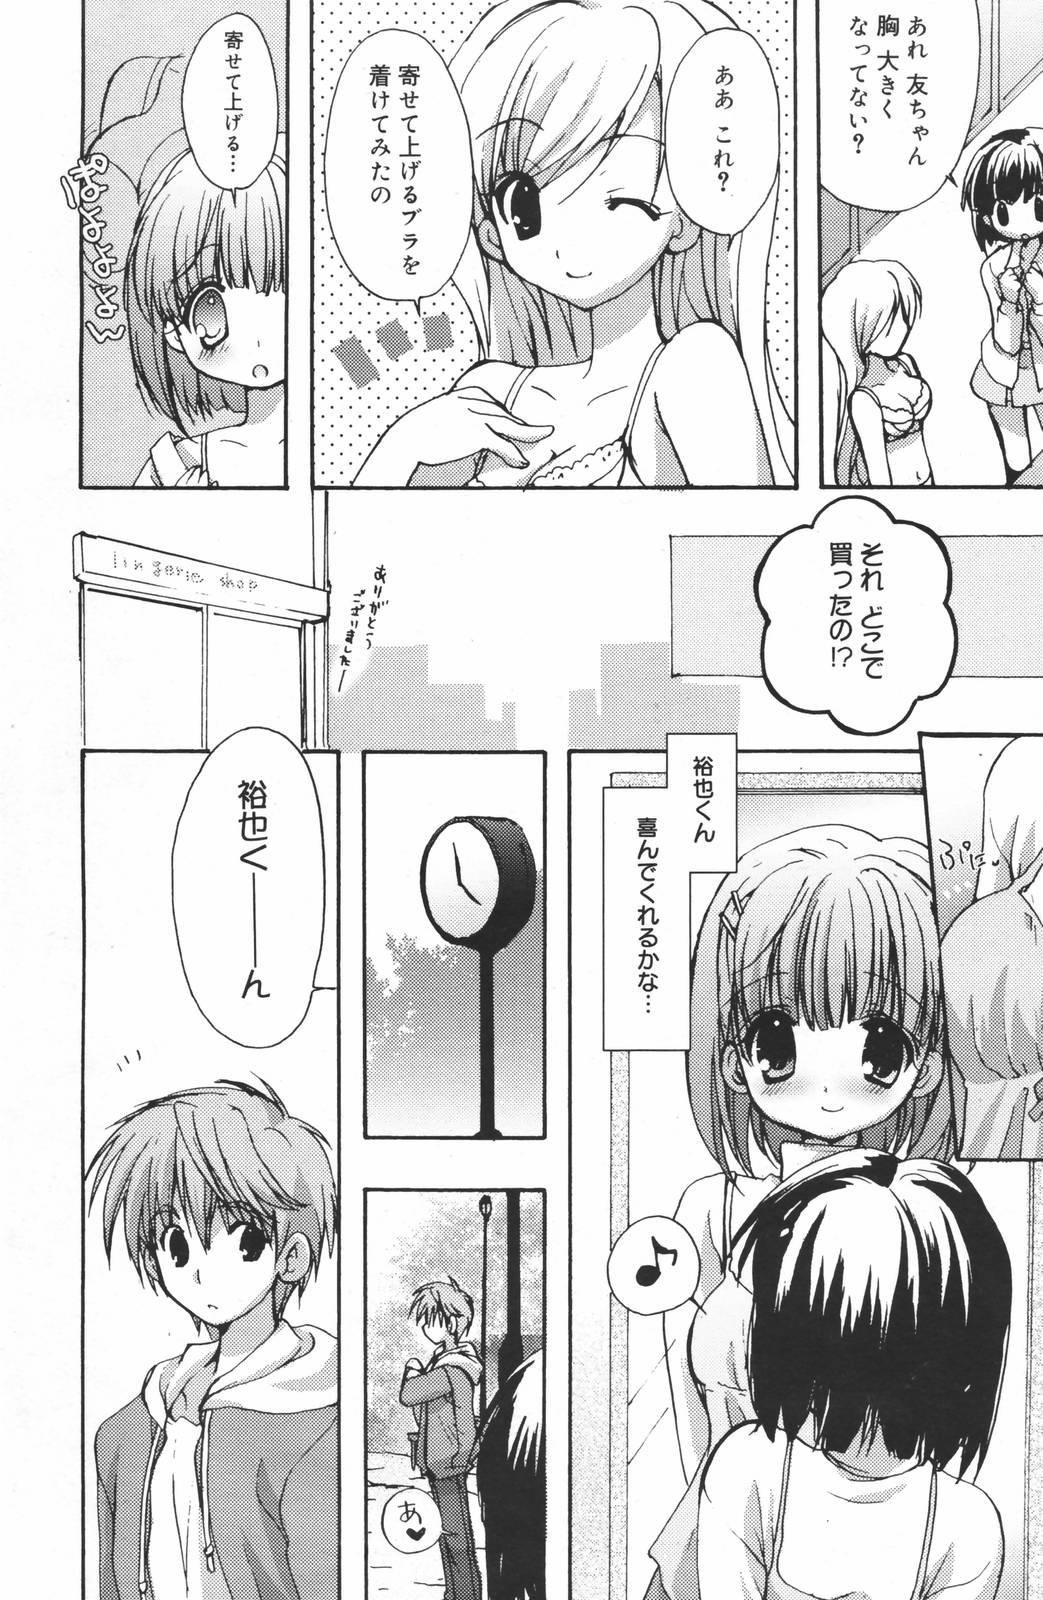 Manga Bangaichi 2007-03 79